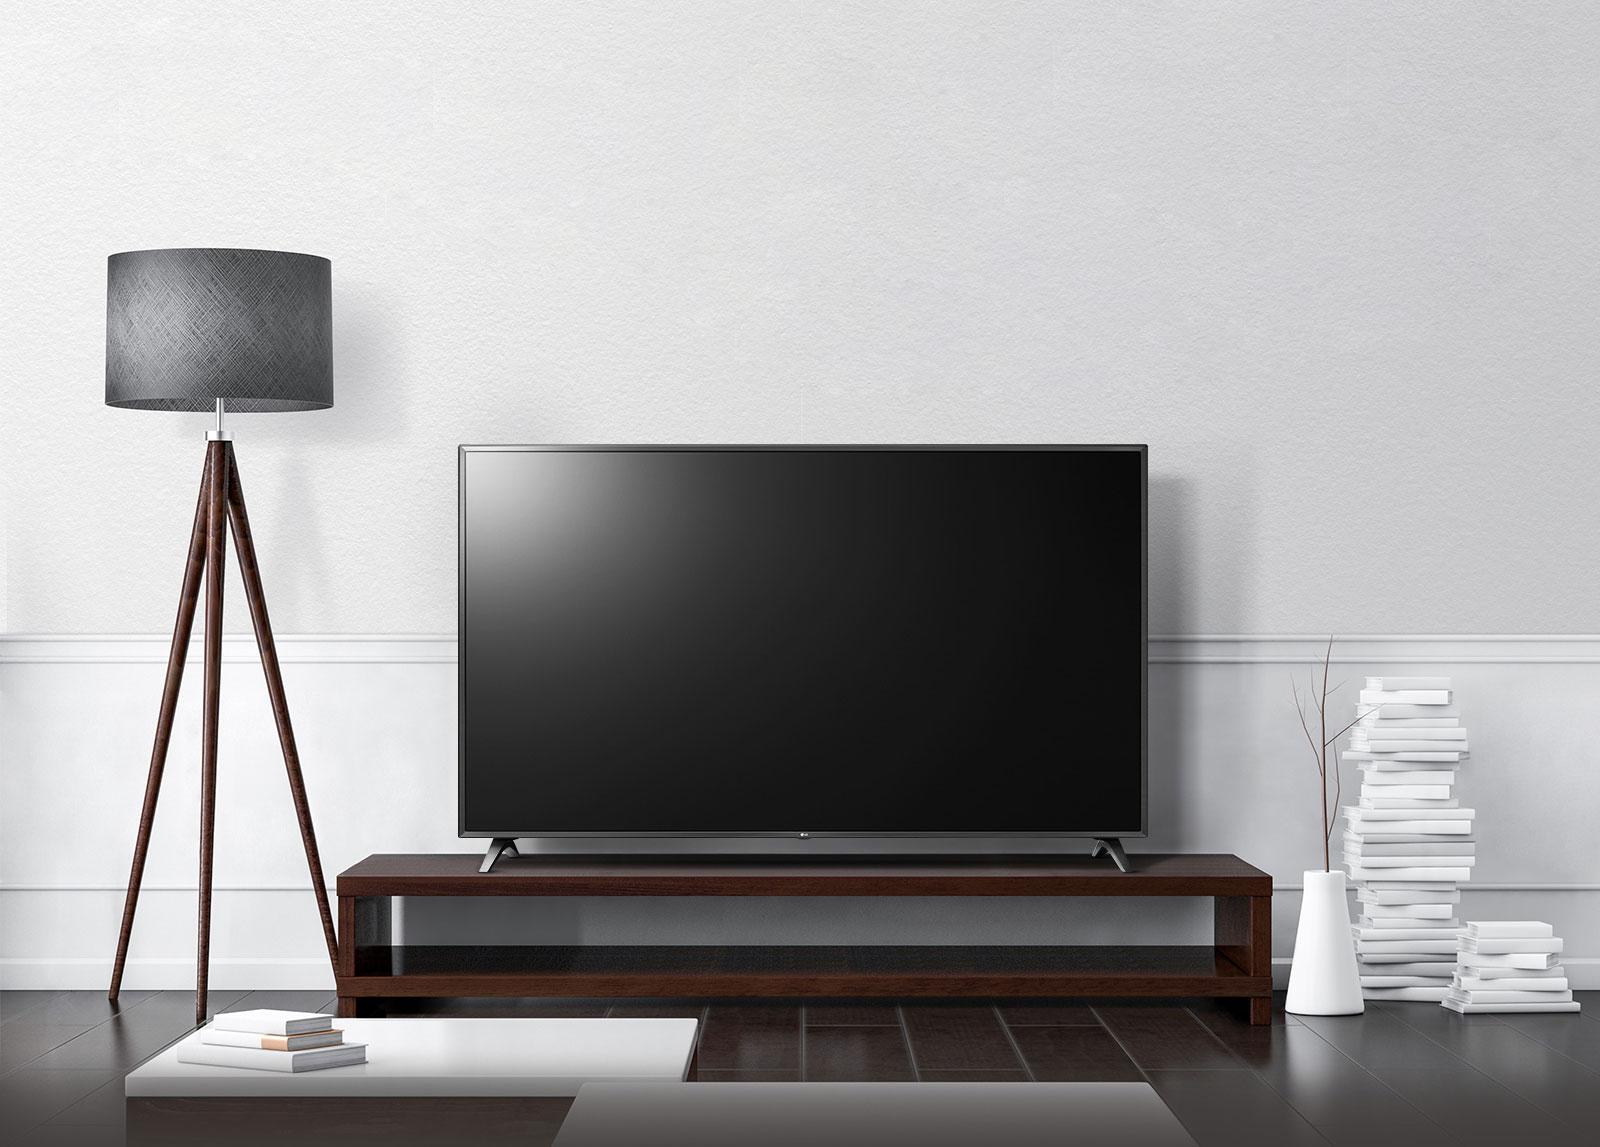 TV-UHD-86-UM75-09-Design-Desktop_jj